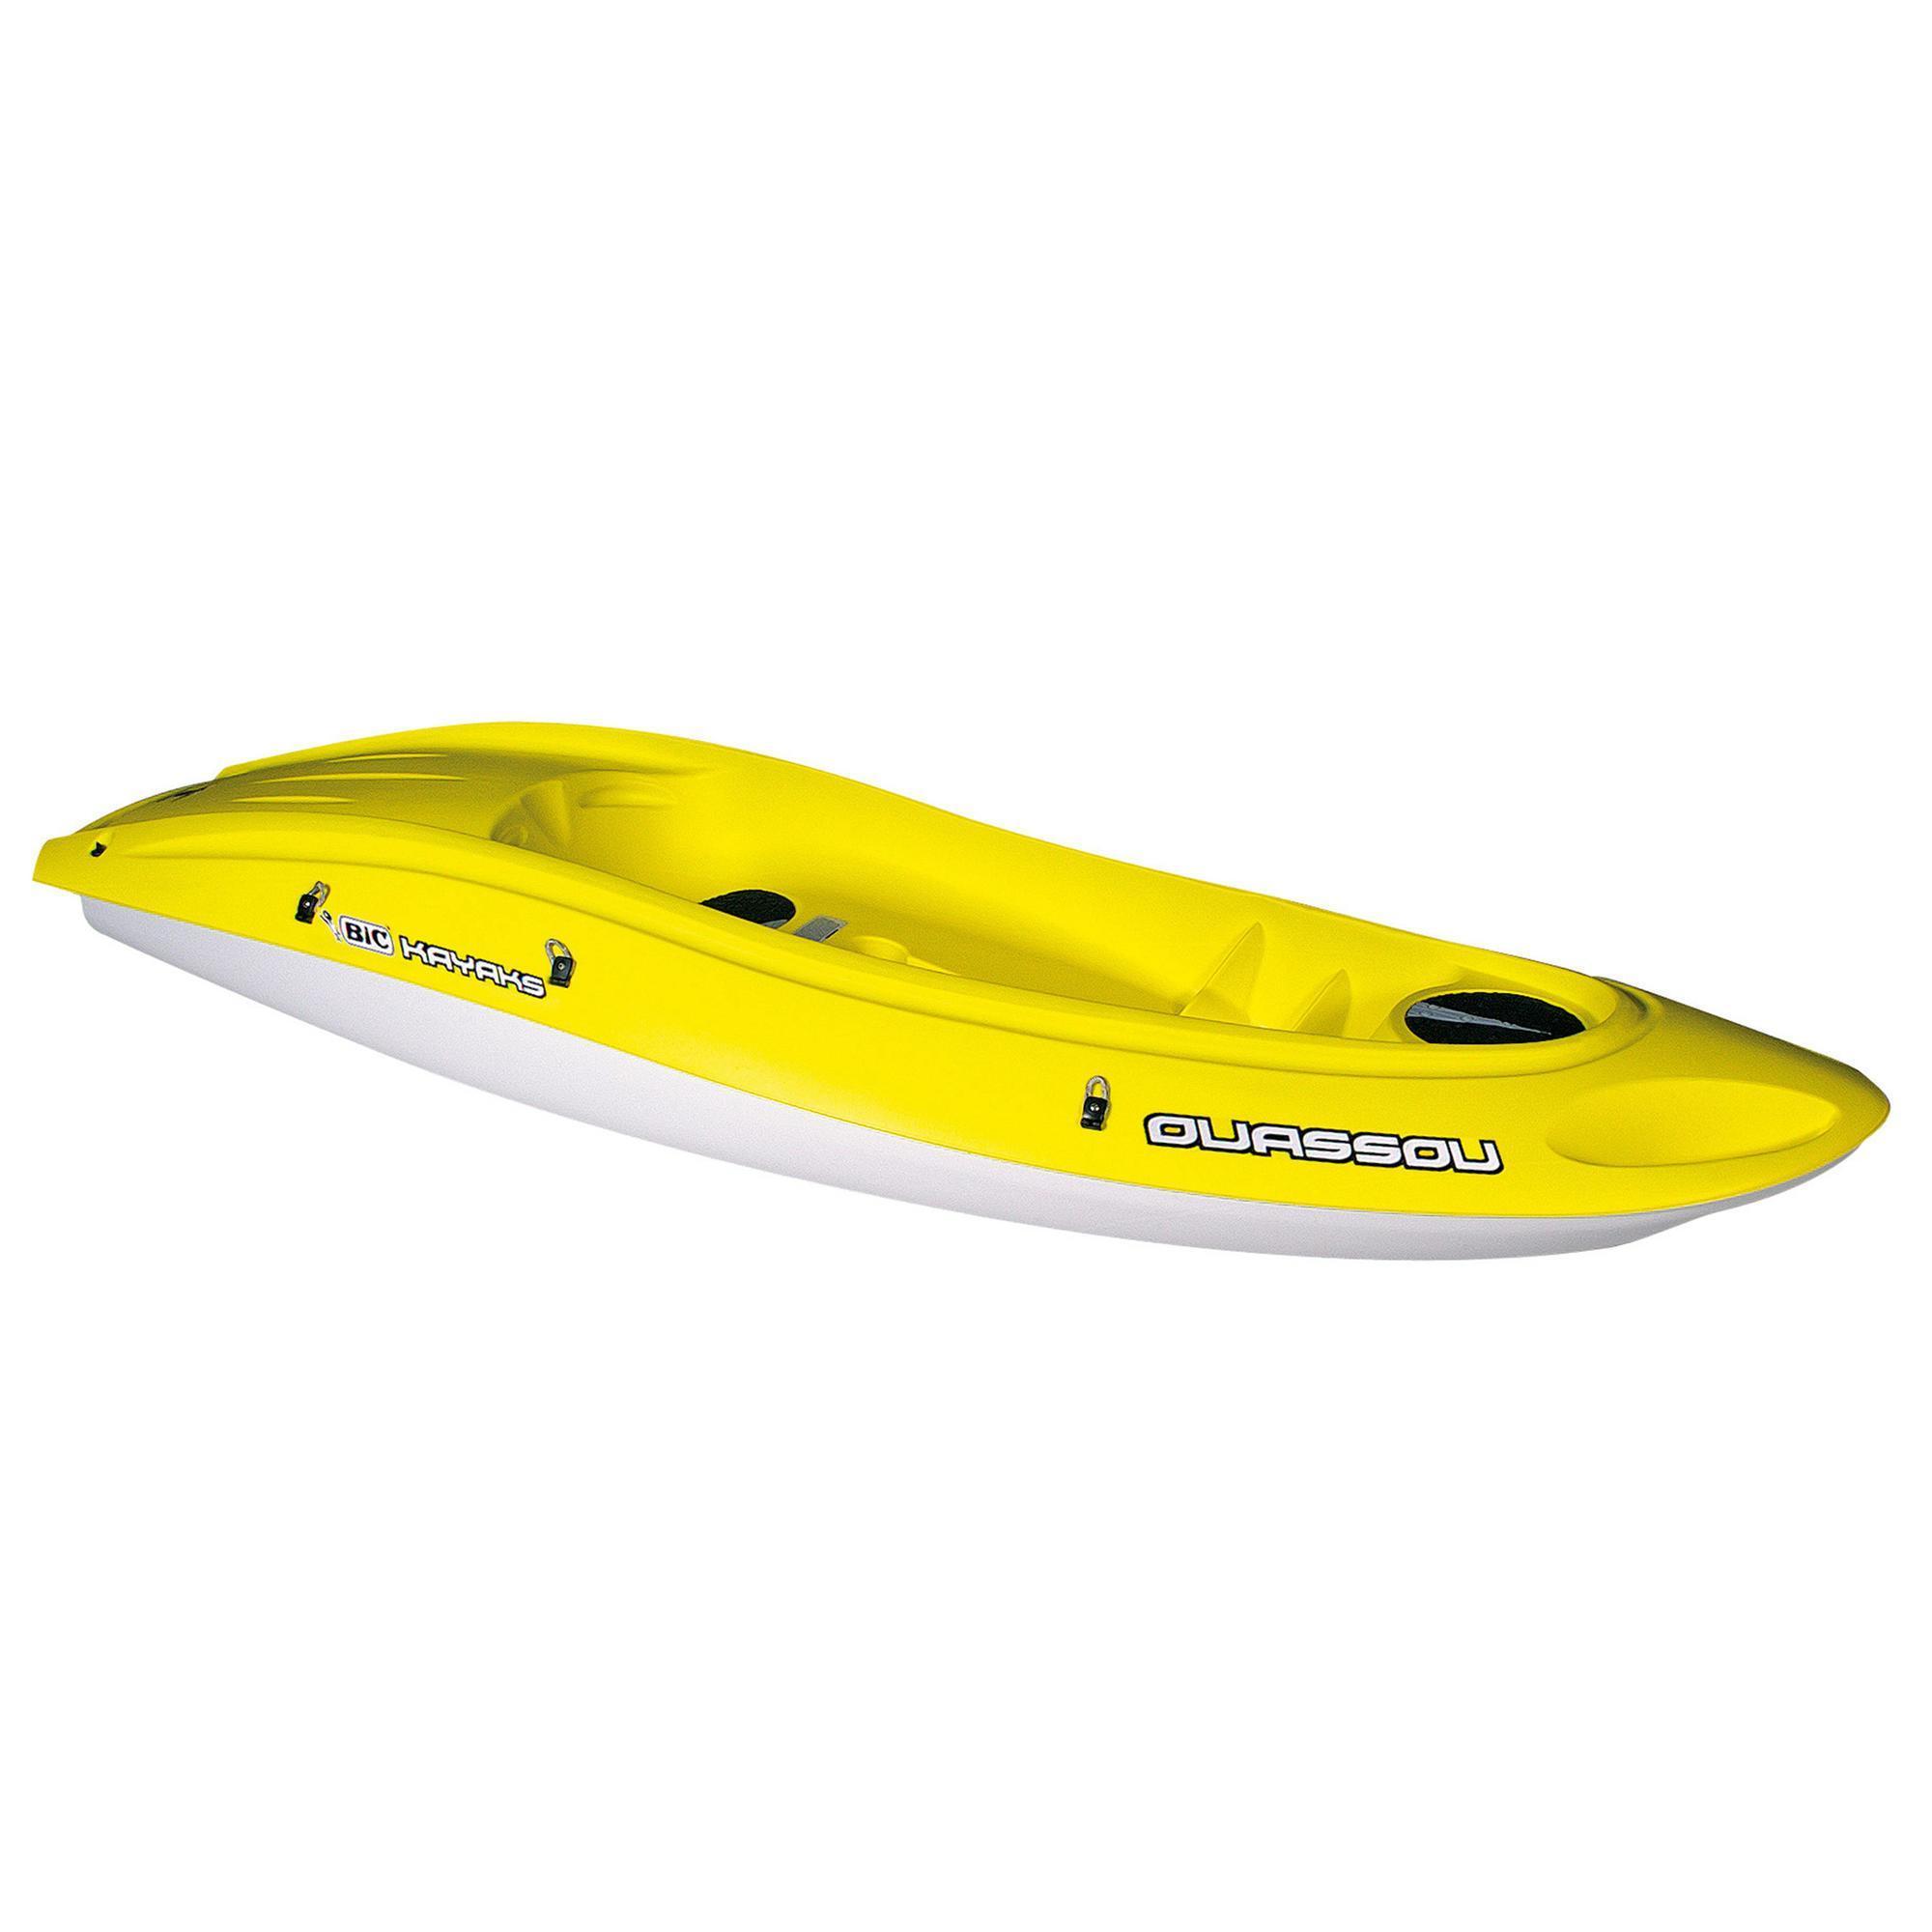 Kayak Decathlon 55 Remise Www Peksen Com Tr